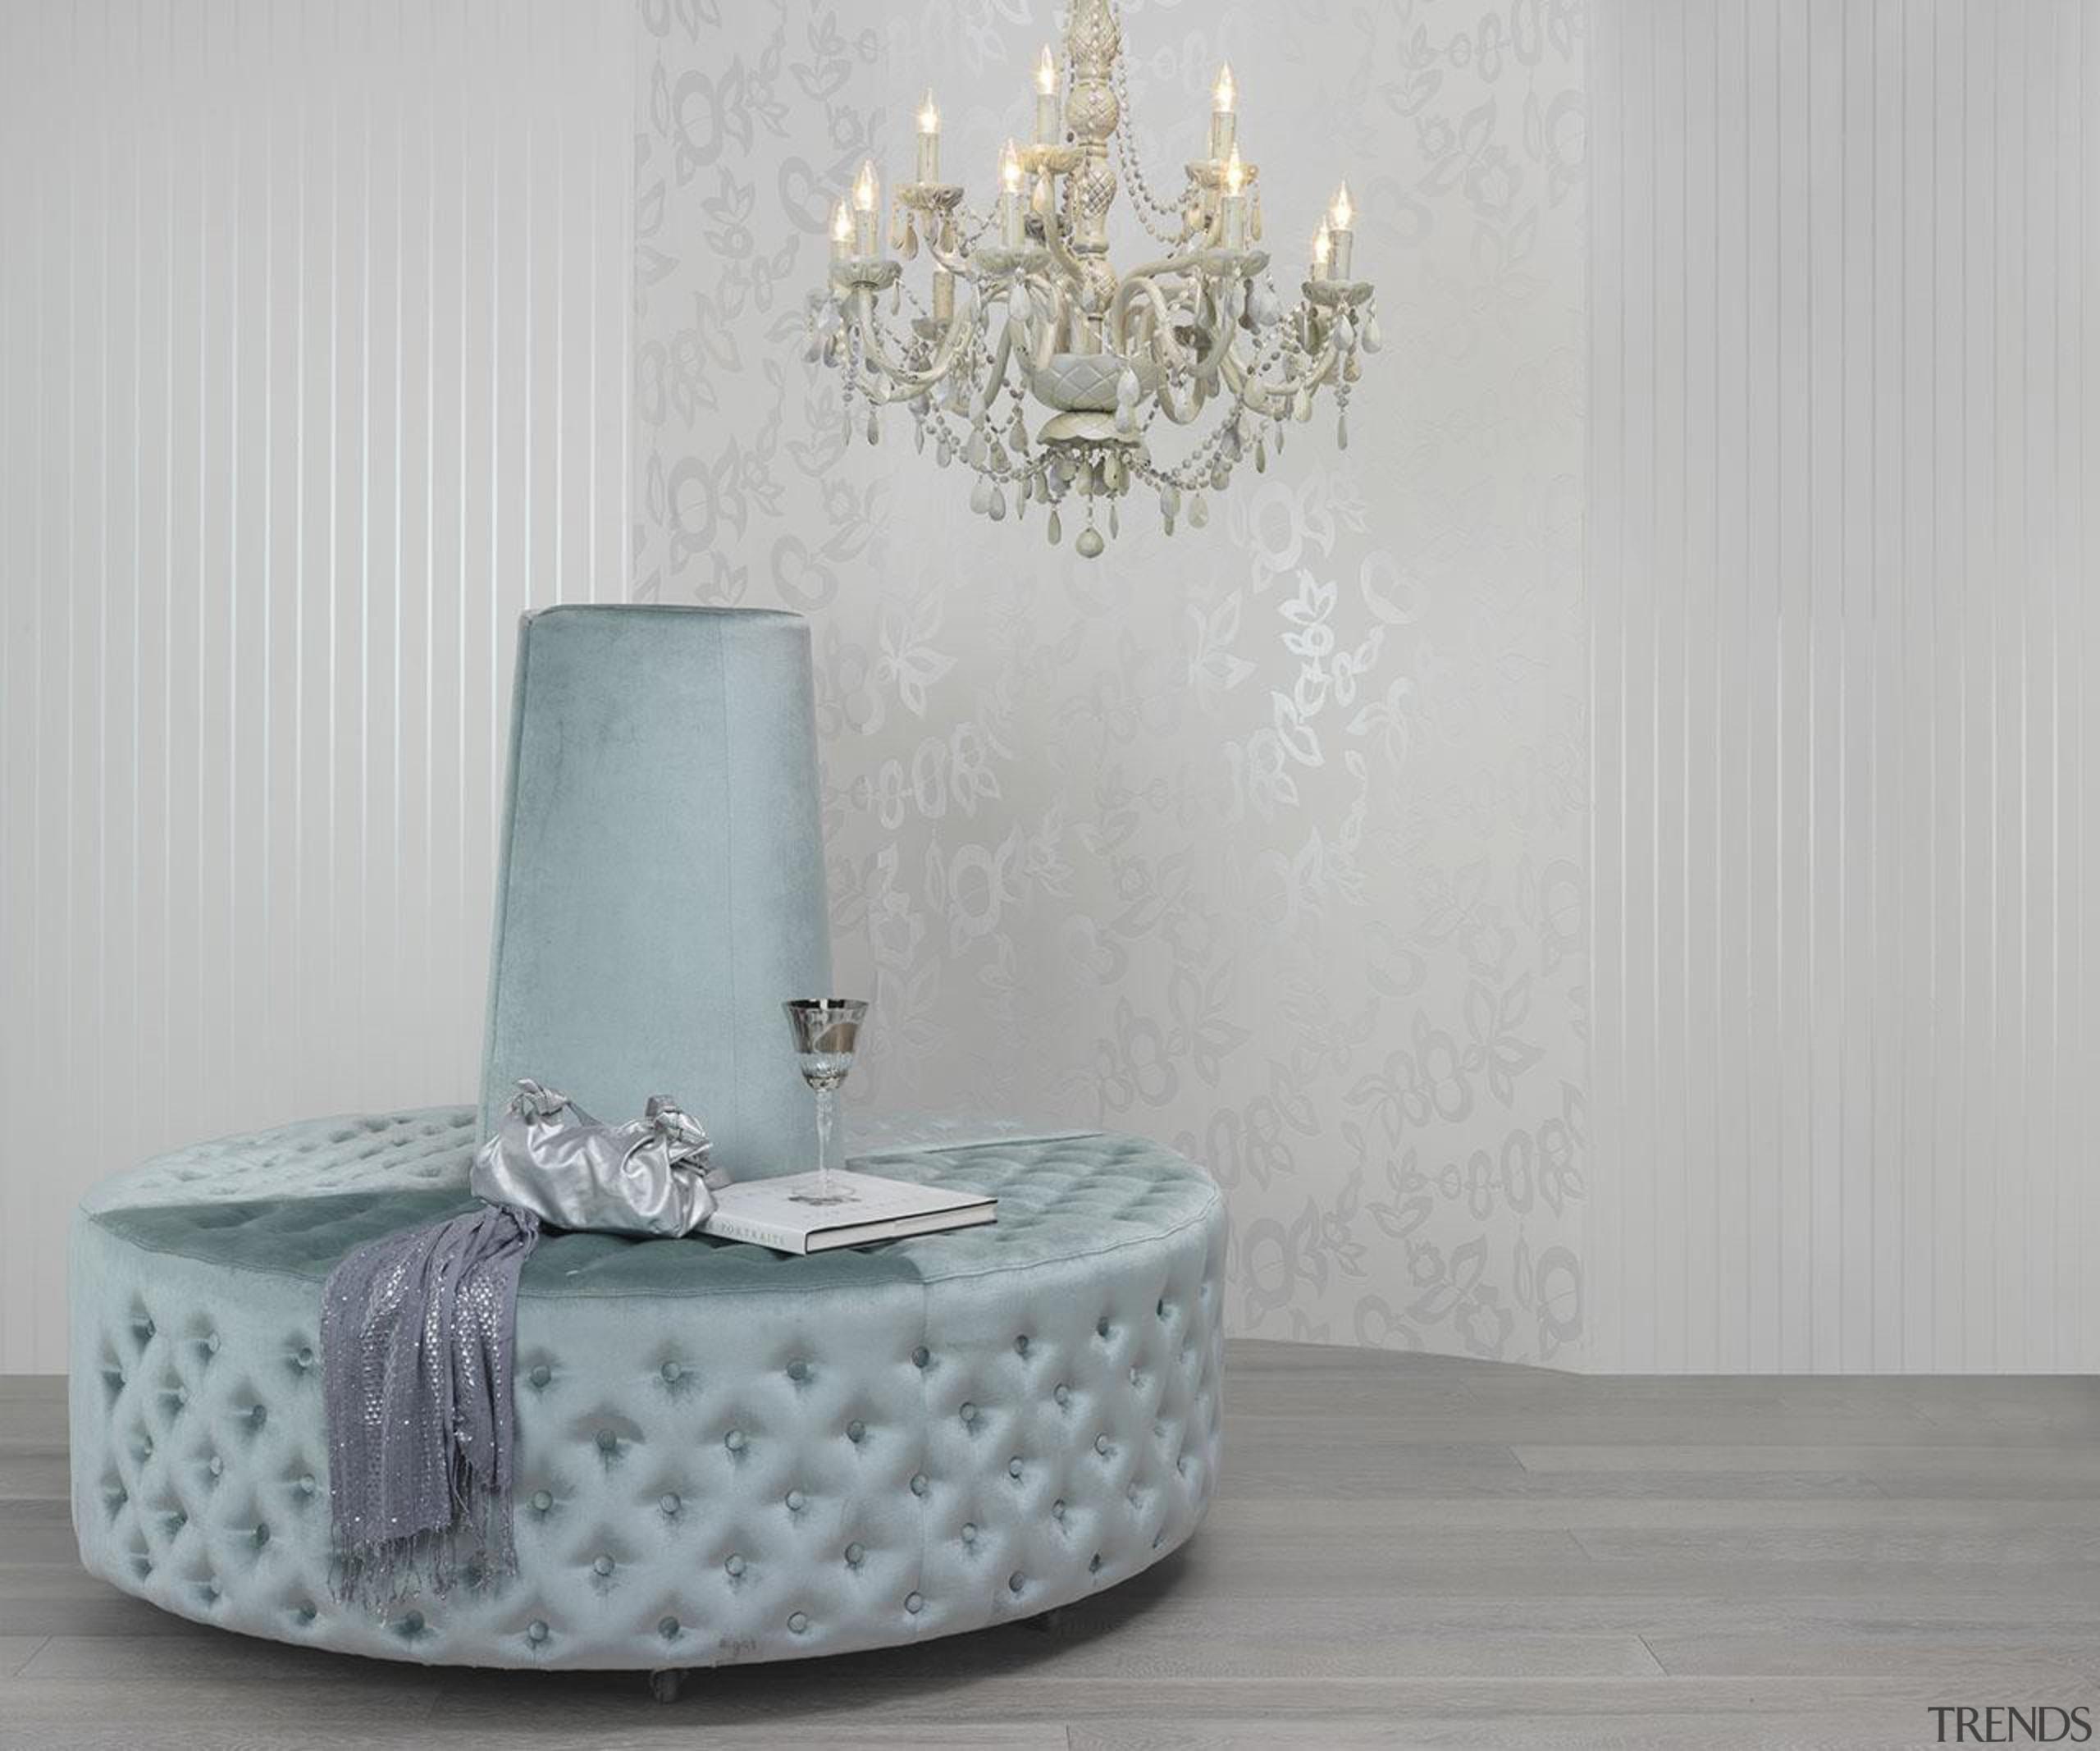 Brocante II Range - Brocante II Range - ceramic, furniture, product, product design, table, gray